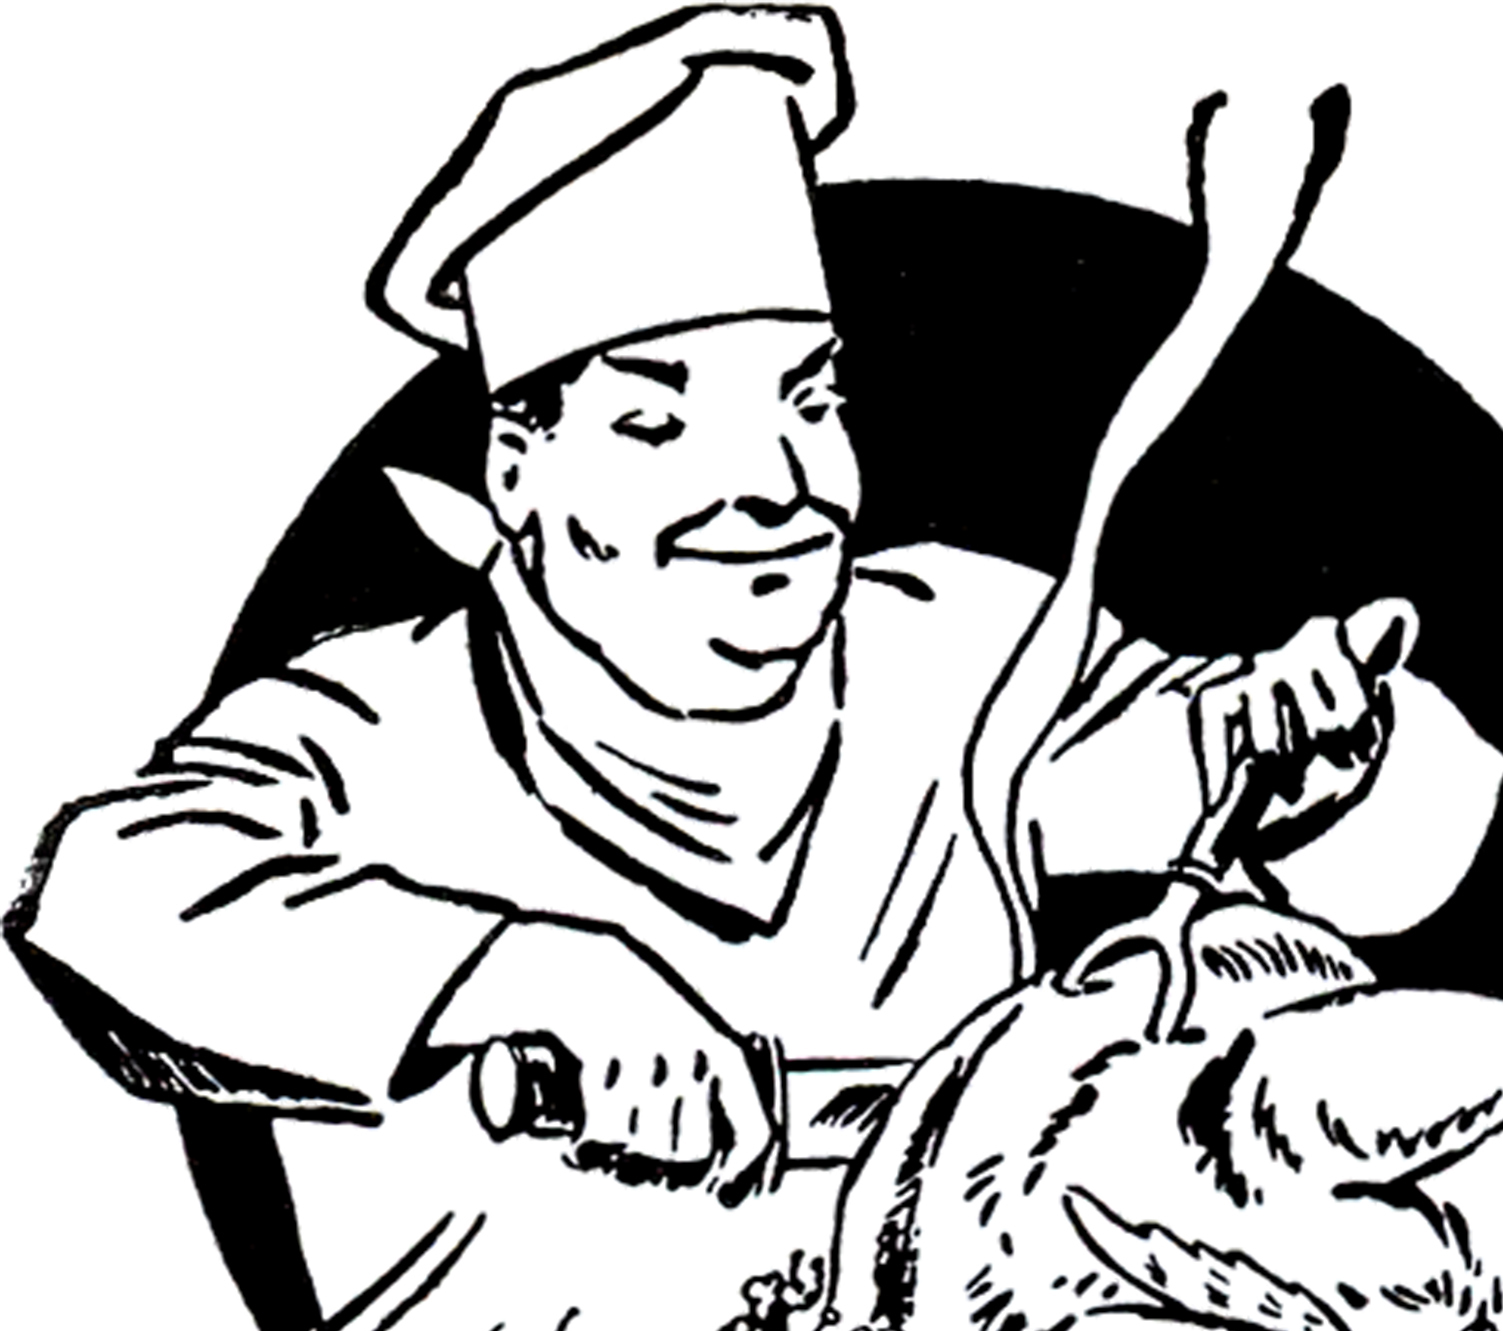 Vintage Turkey Carving Image